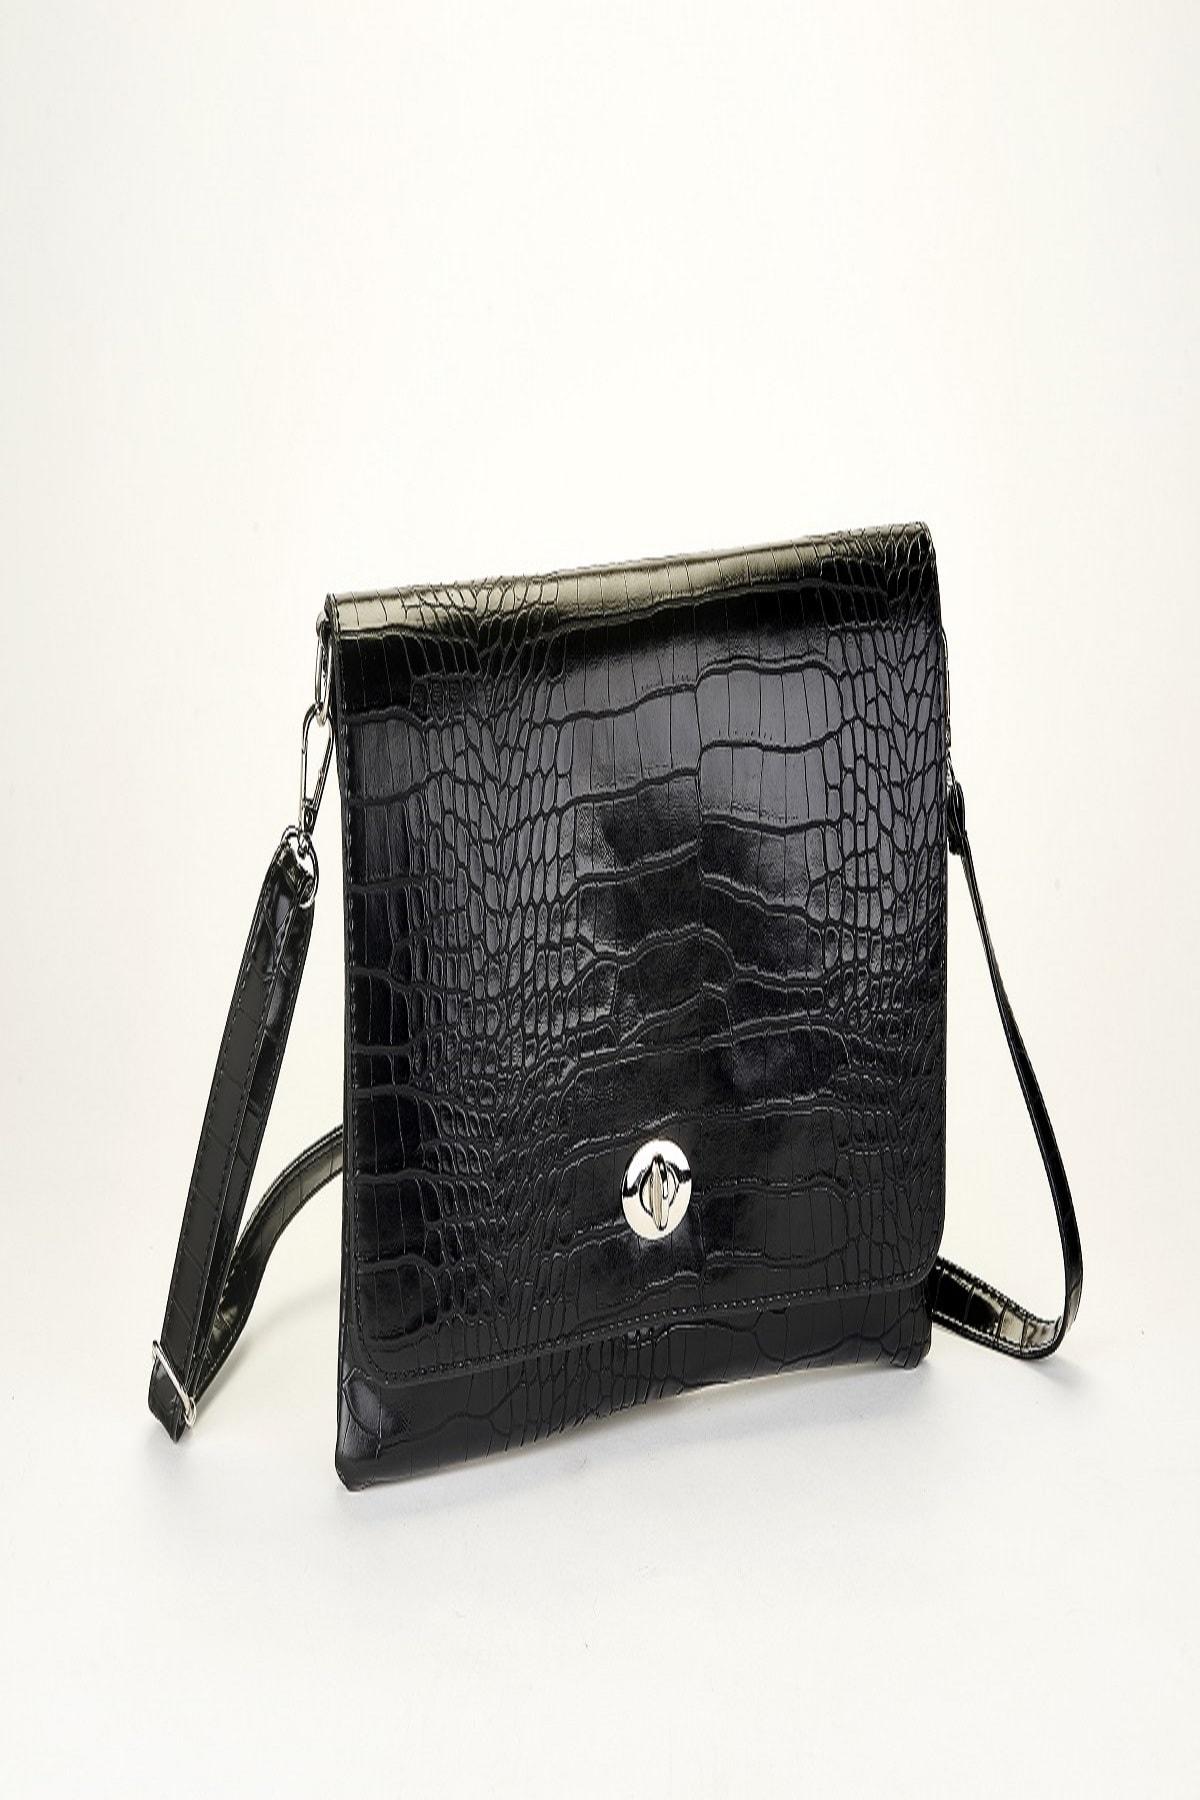 Coquet Accessories Siyah Bellini Clutch 19G3U13N356 1